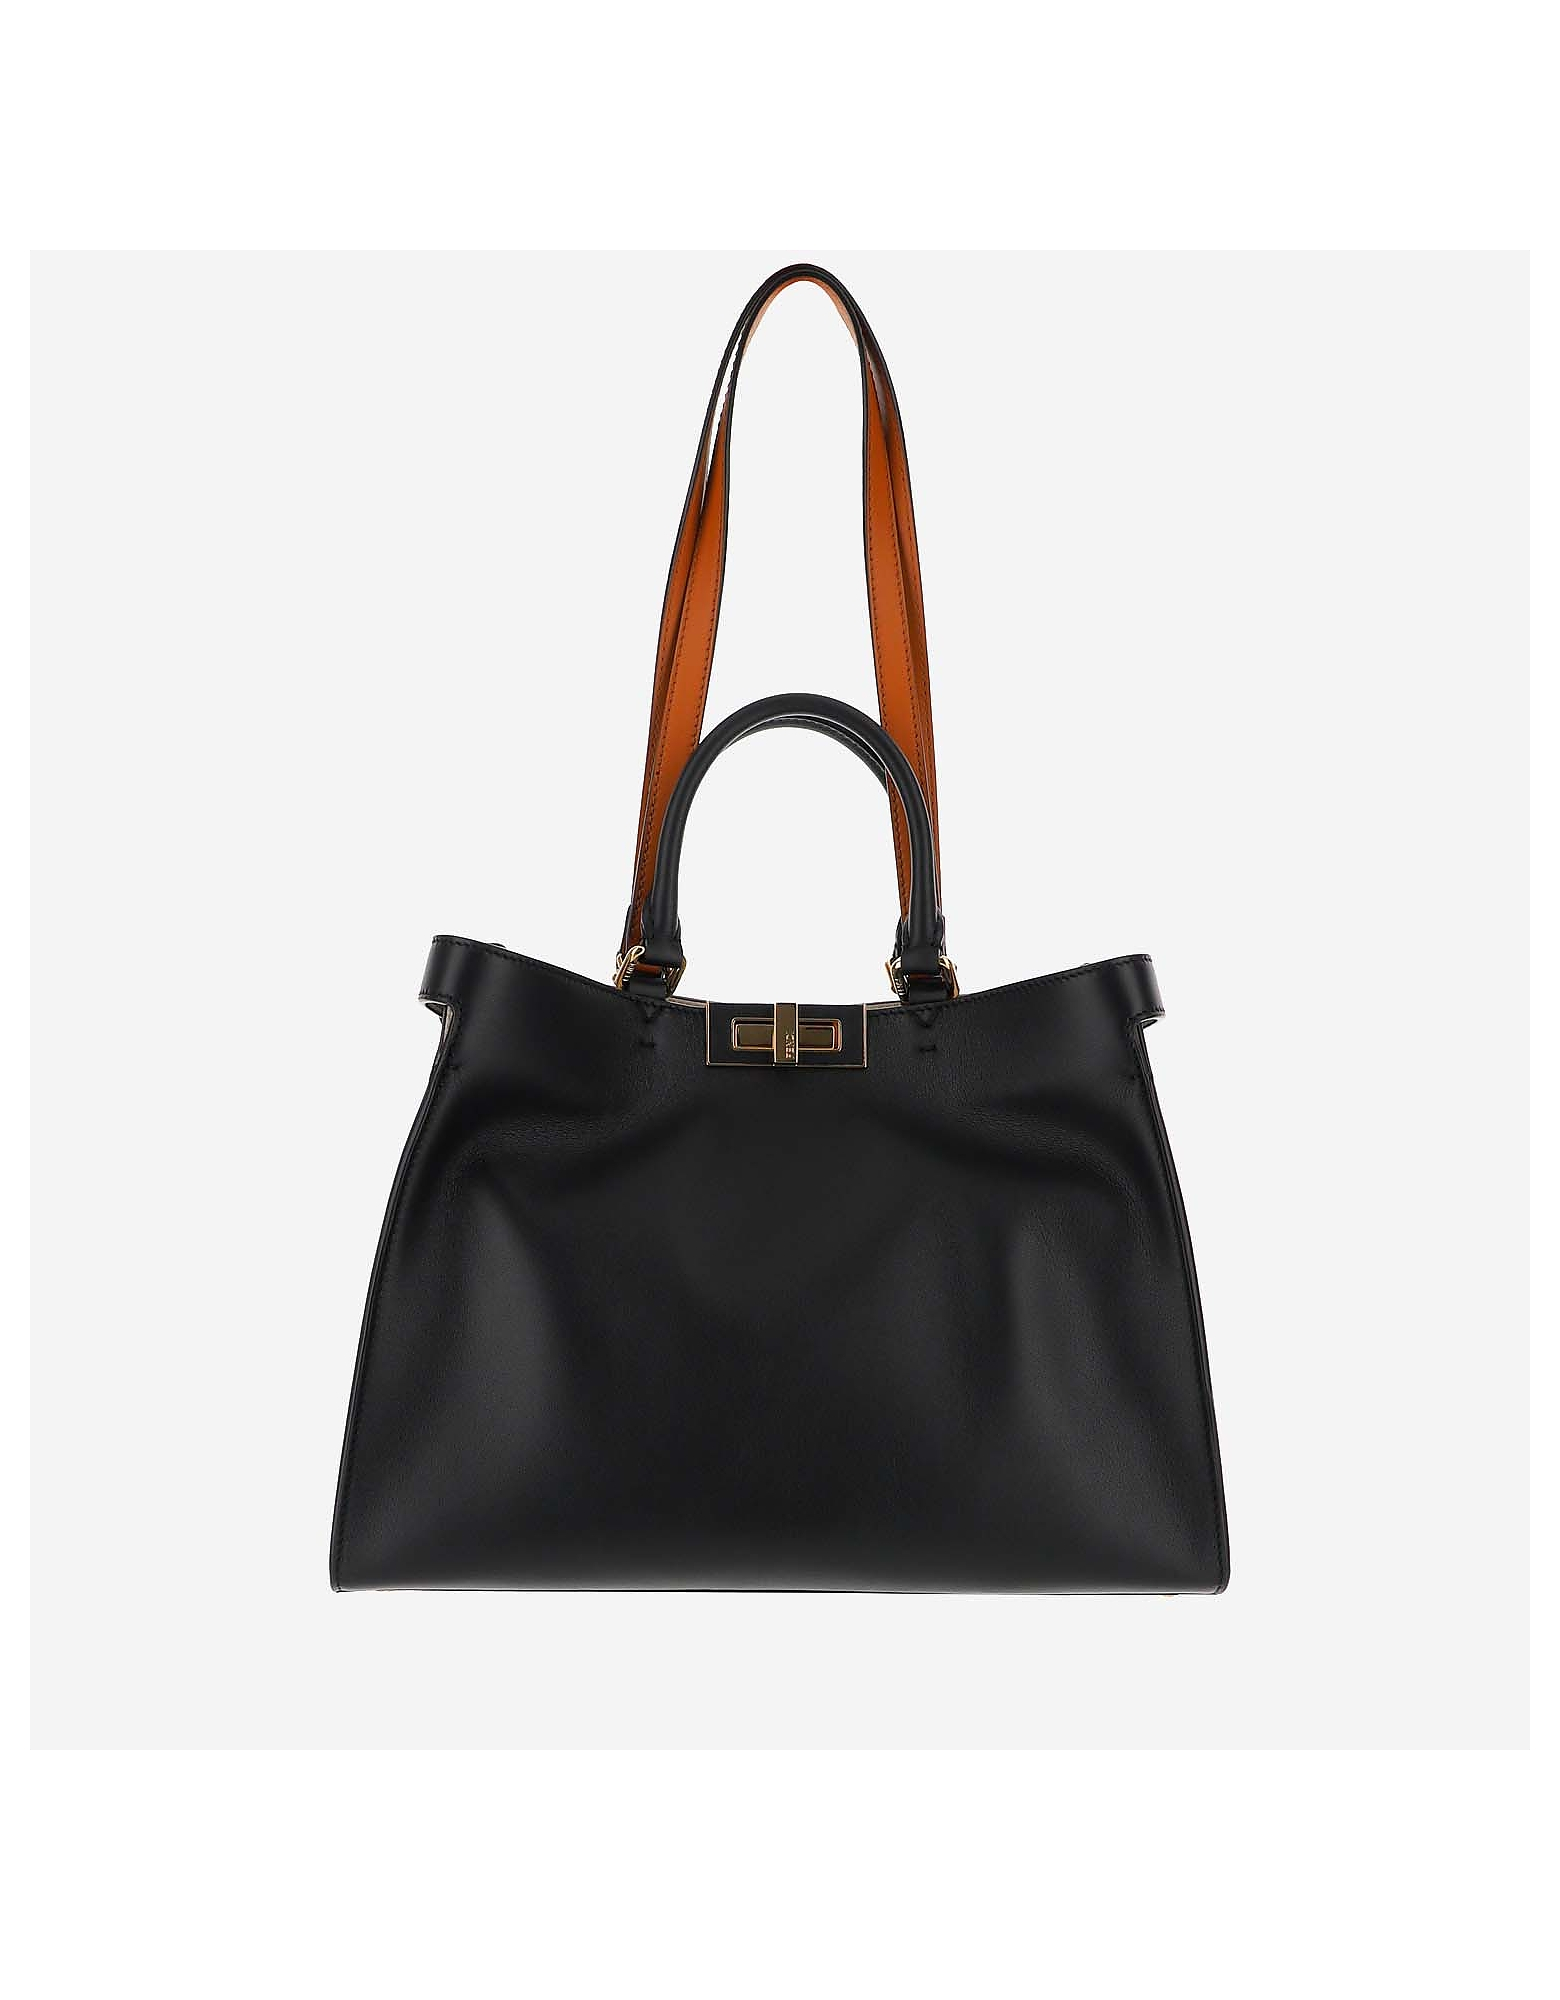 Fendi Designer Handbags, Orange bag